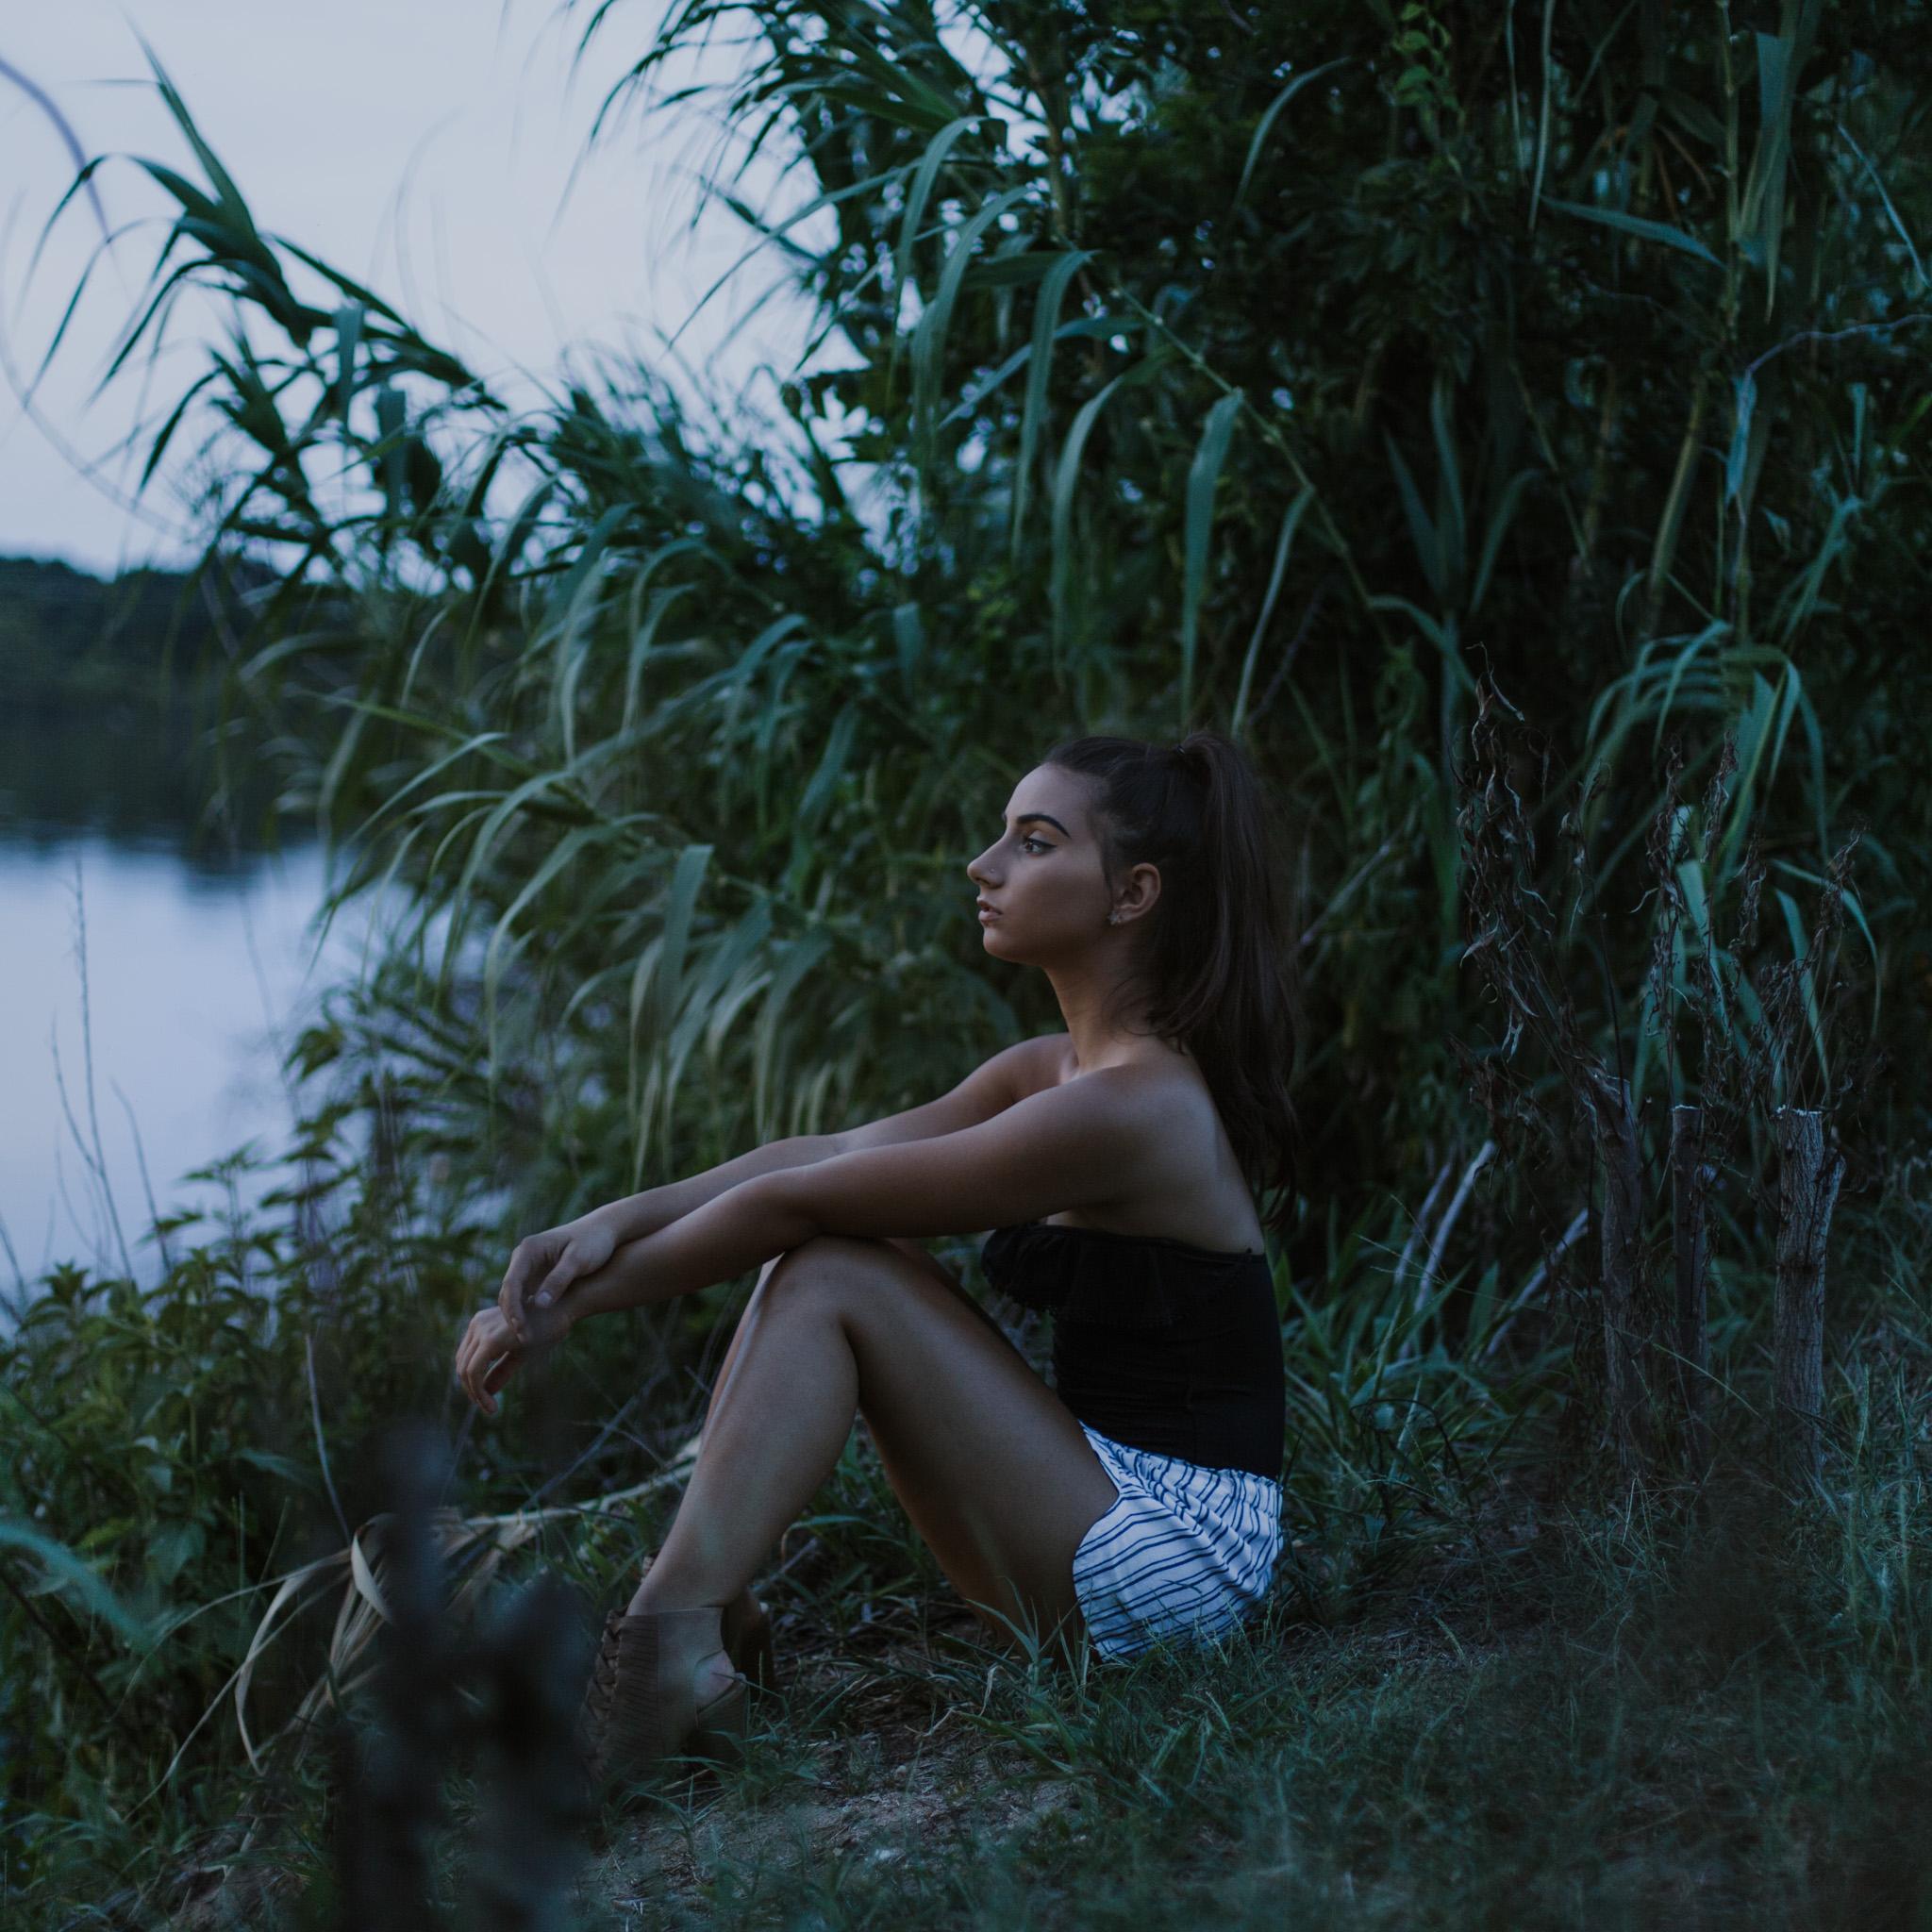 Ailin Hyde Portrait Photography